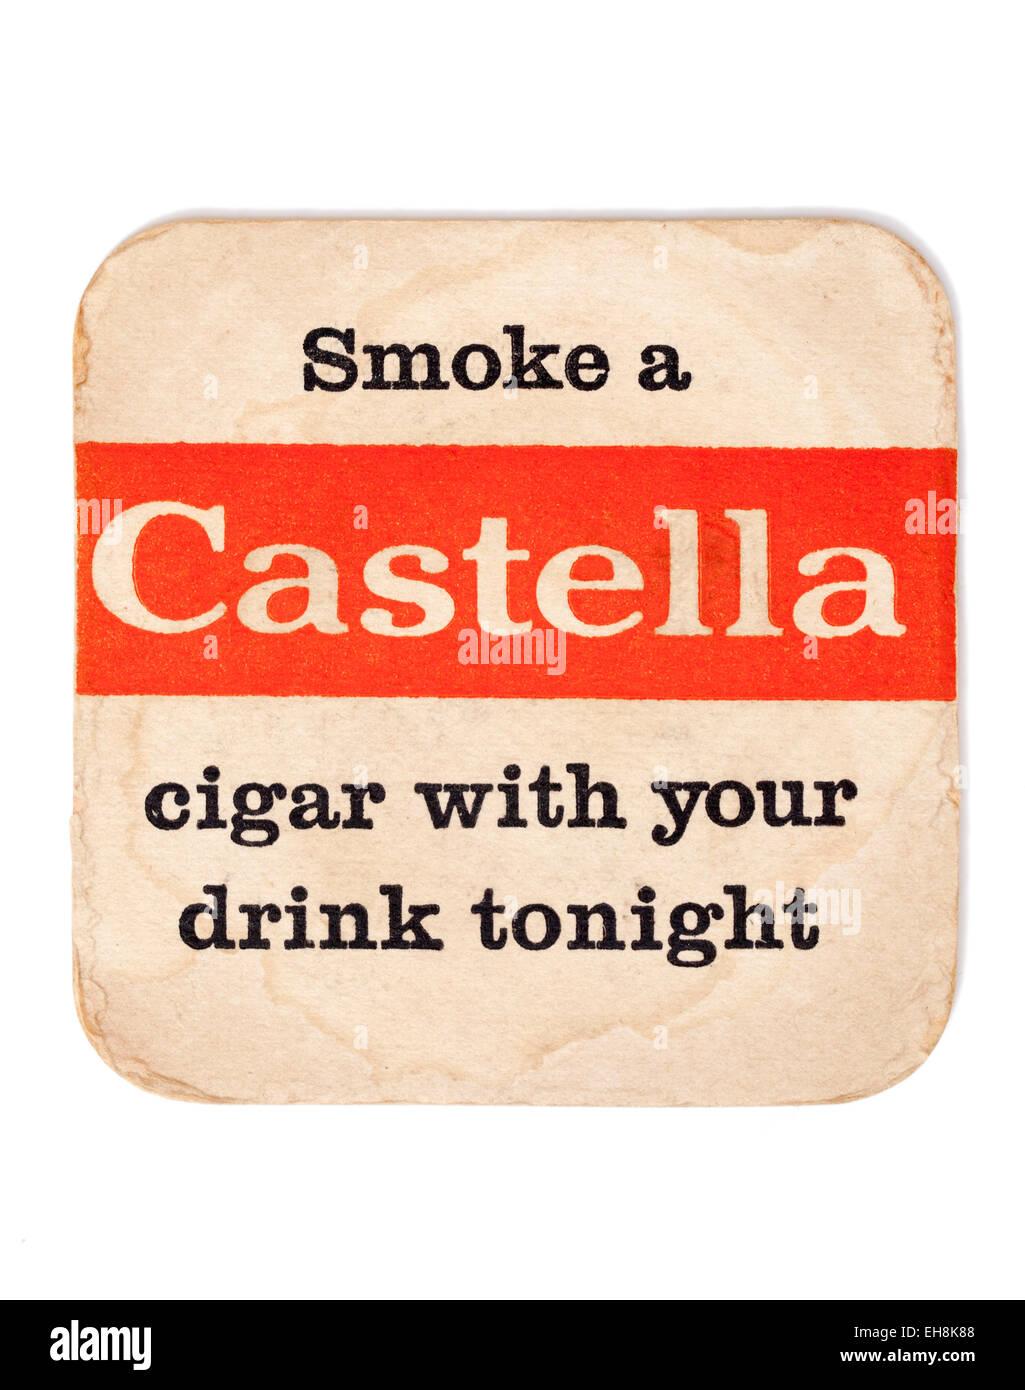 Vintage Beermat Advertising Castella Cigars - Stock Image